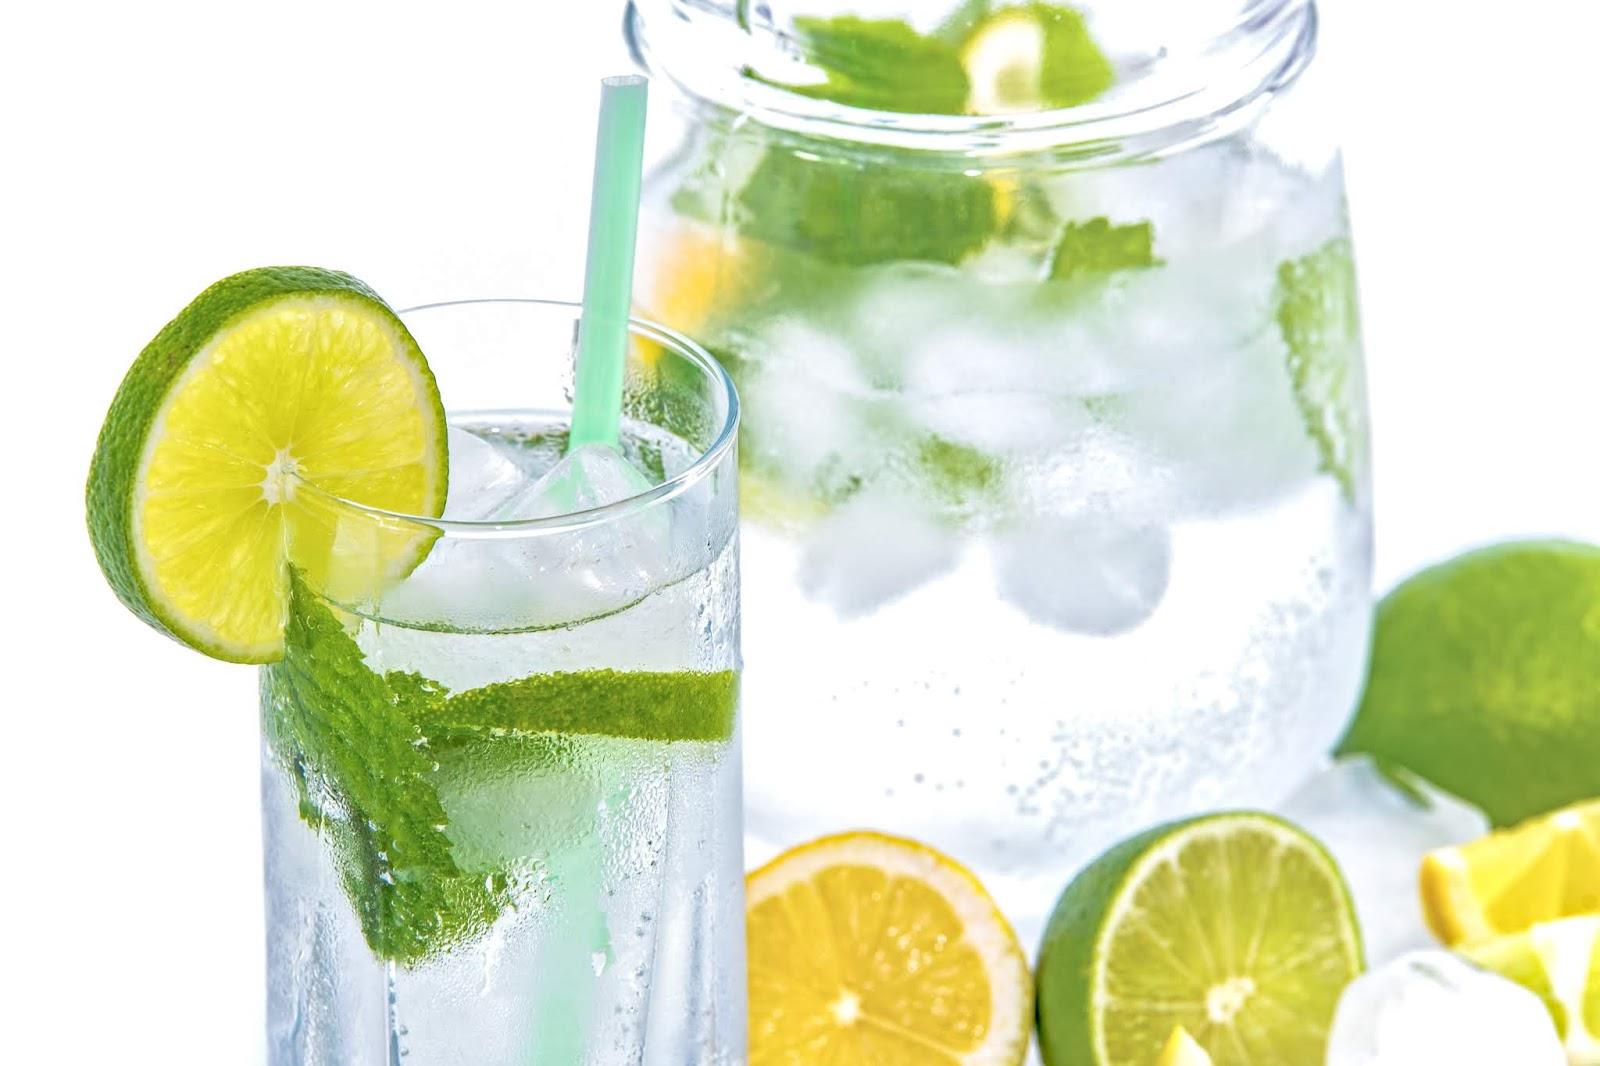 9 नींबू वरबेना के अद्भुत लाभ   9 Amazing Benefits Of Lemon Verbena